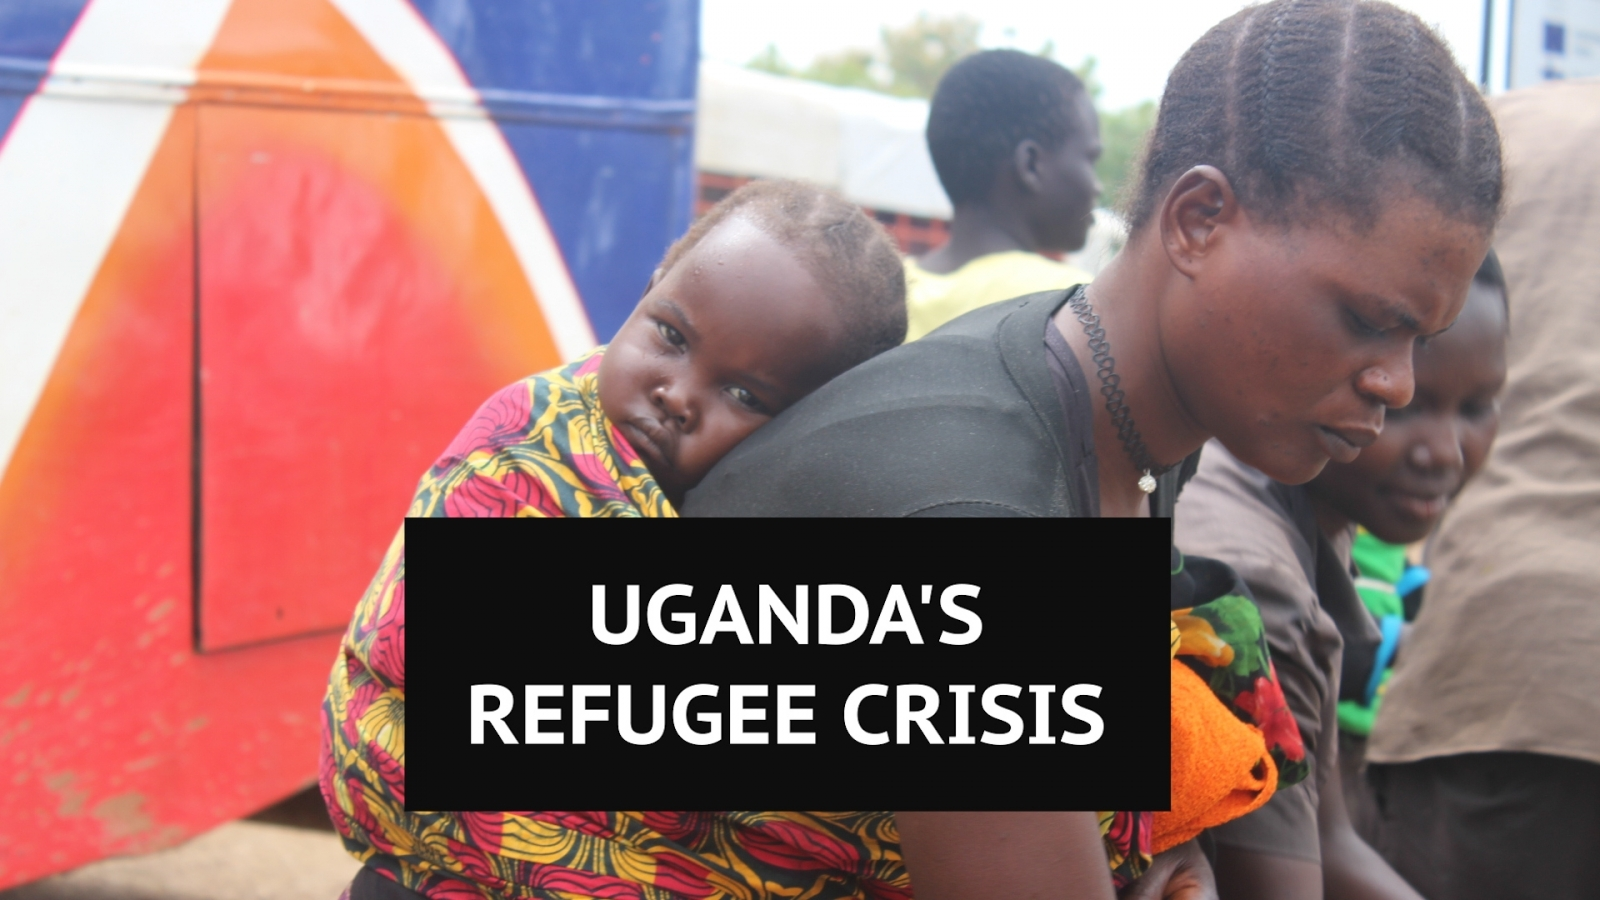 Uganda's refugee crisis